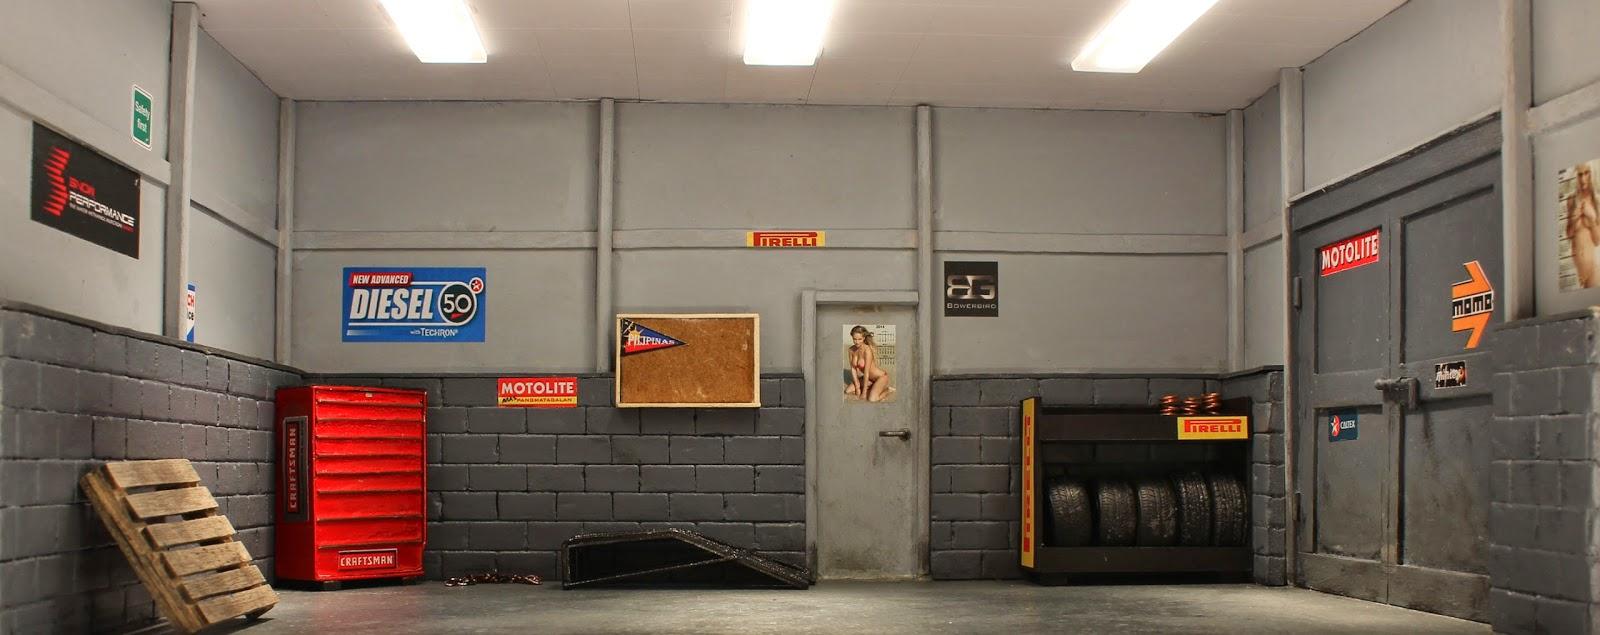 Bowerbird Garage Bowerbird Garage Morton